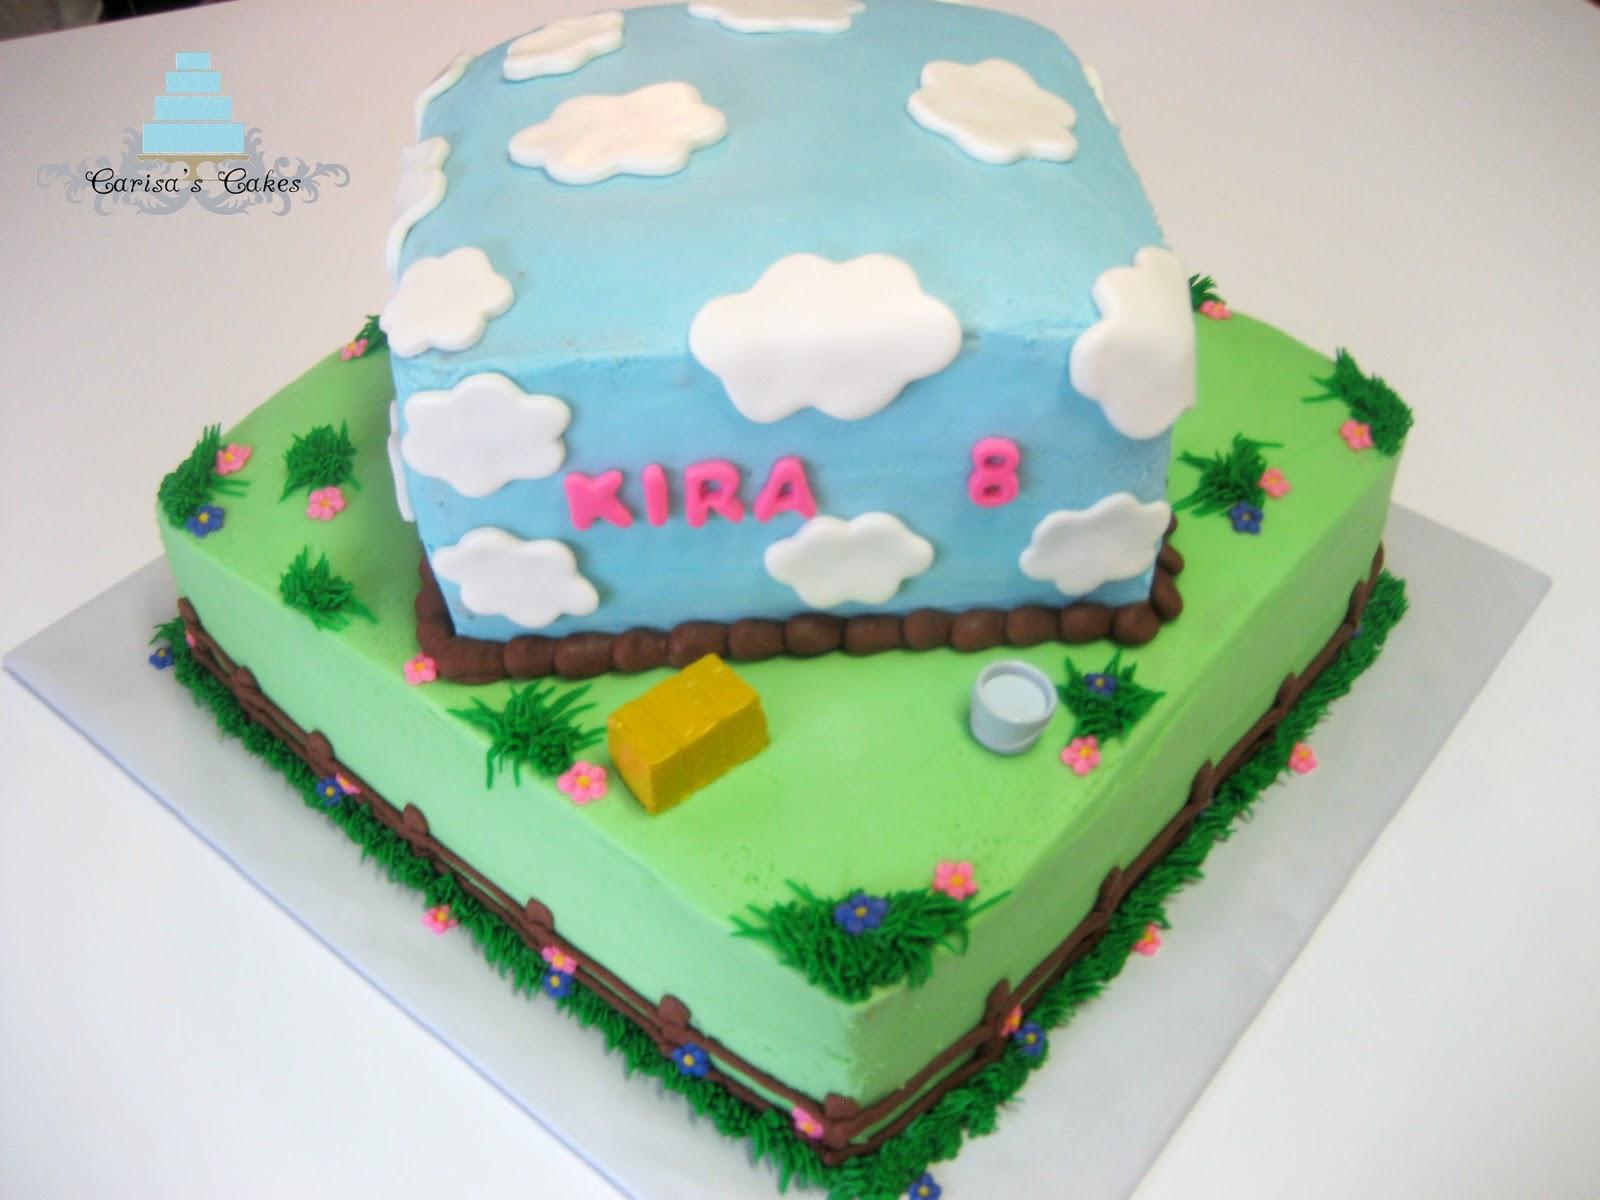 Carisas Cakes Horse Themed Birthday Cake